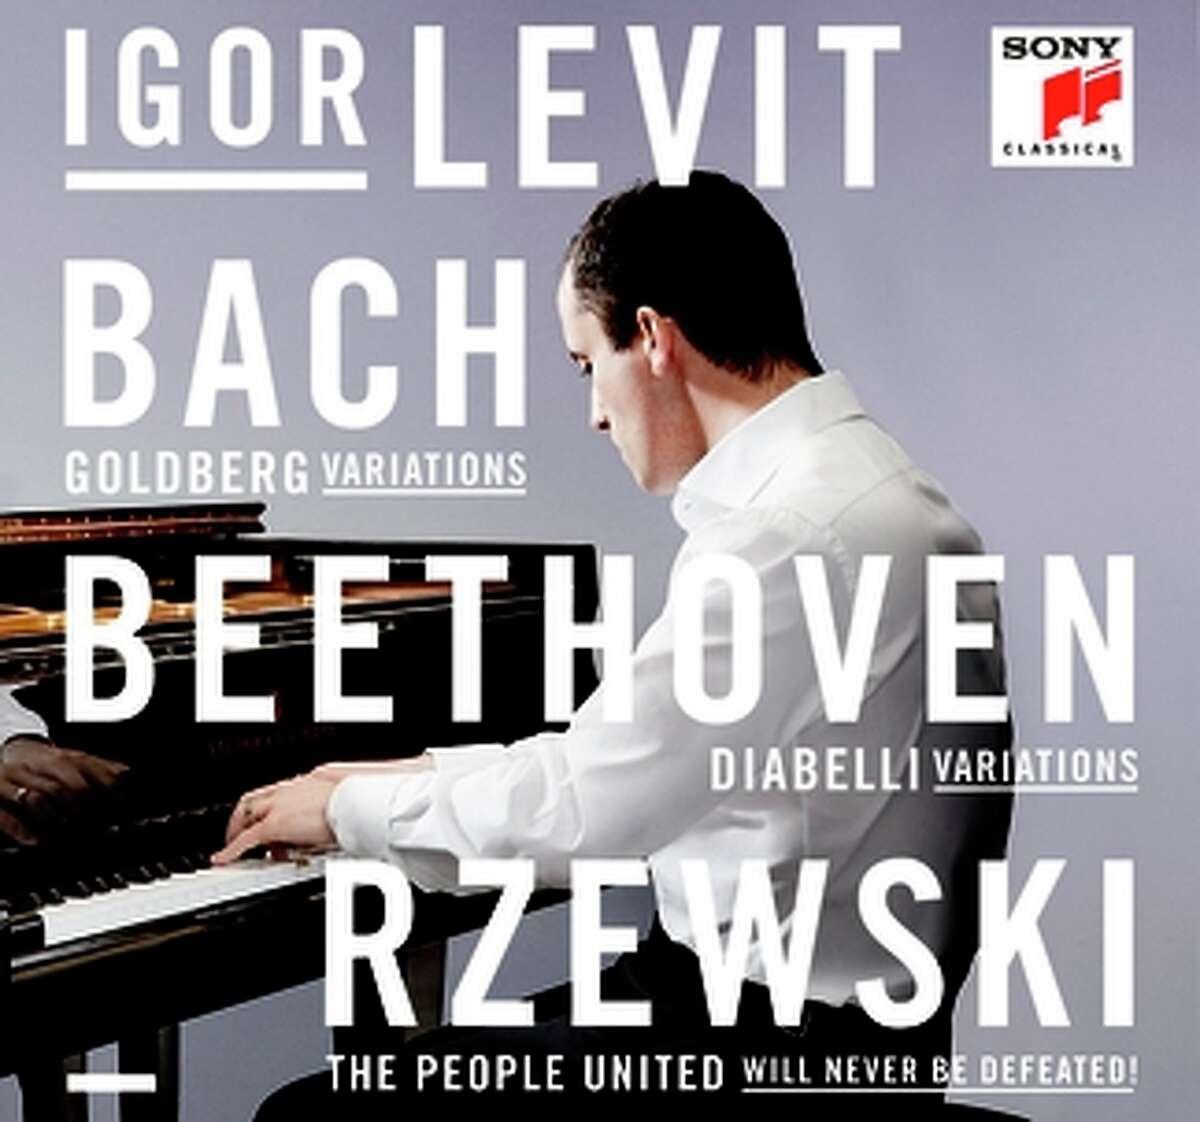 Igor Levit, Piano Variations